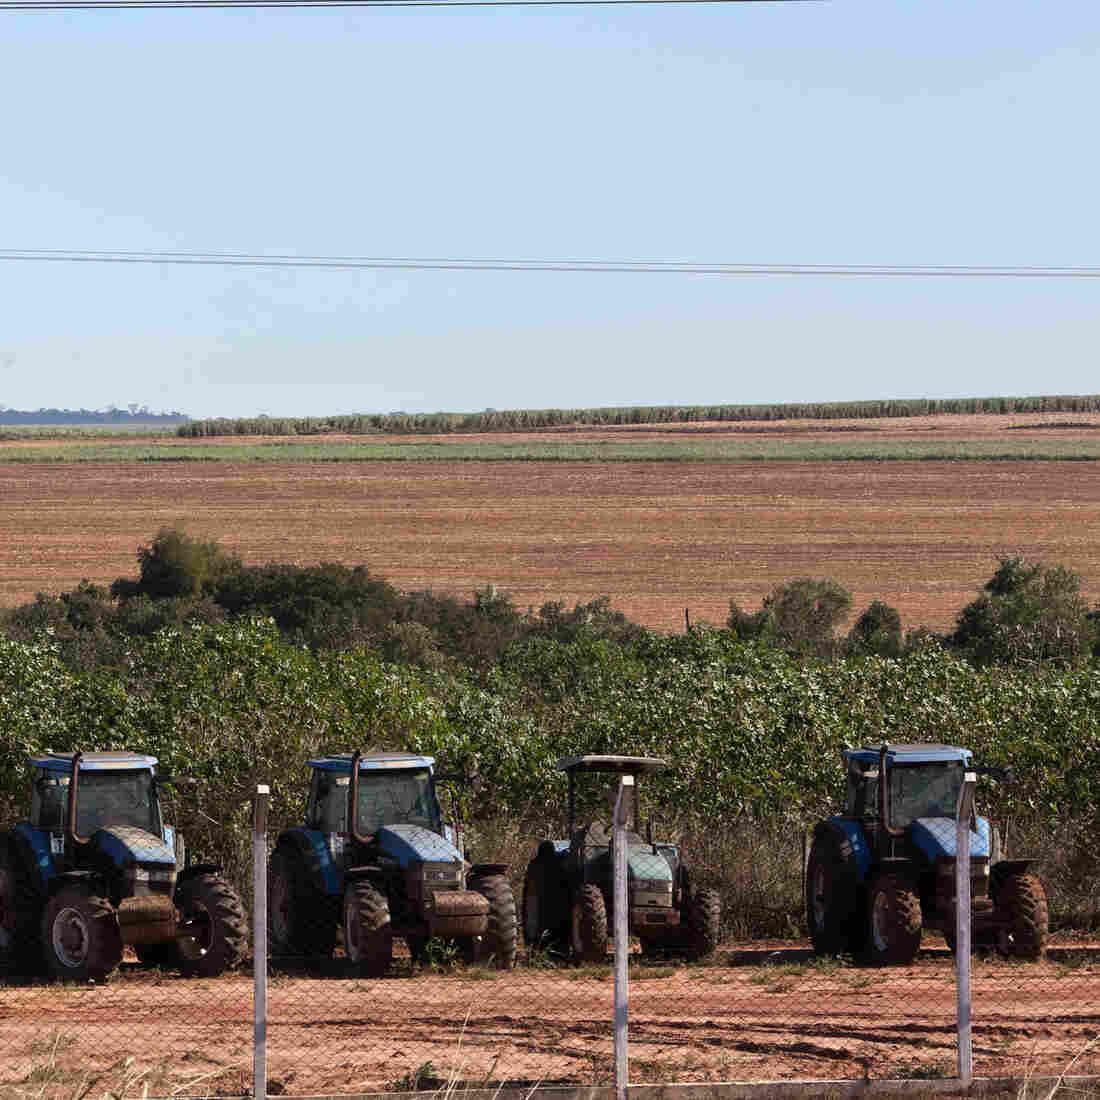 Pepsi Pressured To Fight Big Sugar's 'Land Grab'